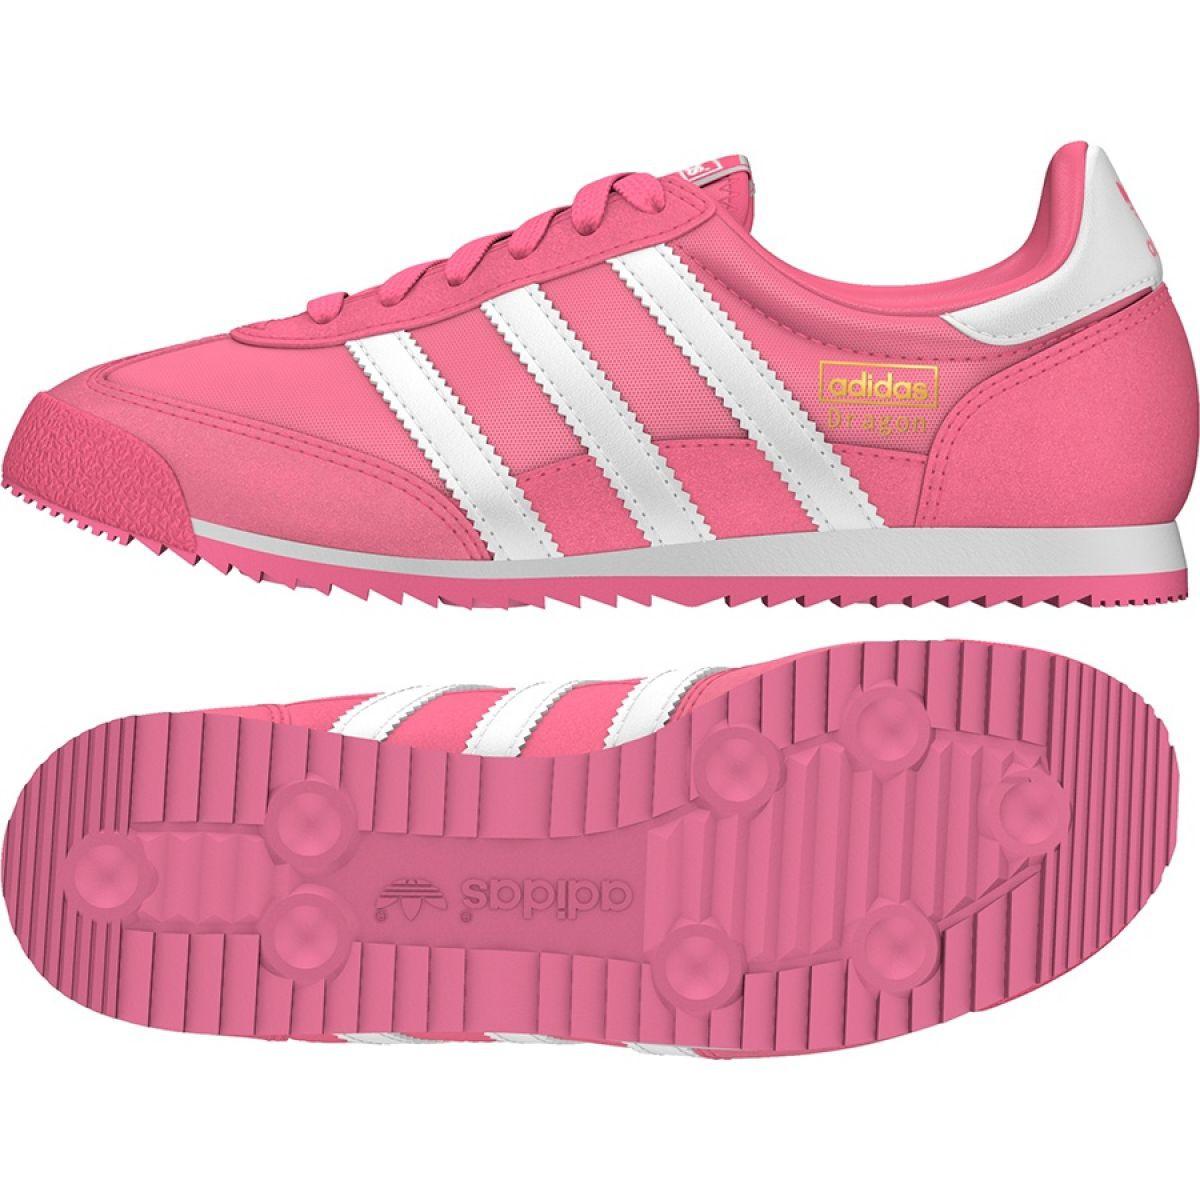 Adidas Originals Dragon Og Jr BB2489 shoes pink